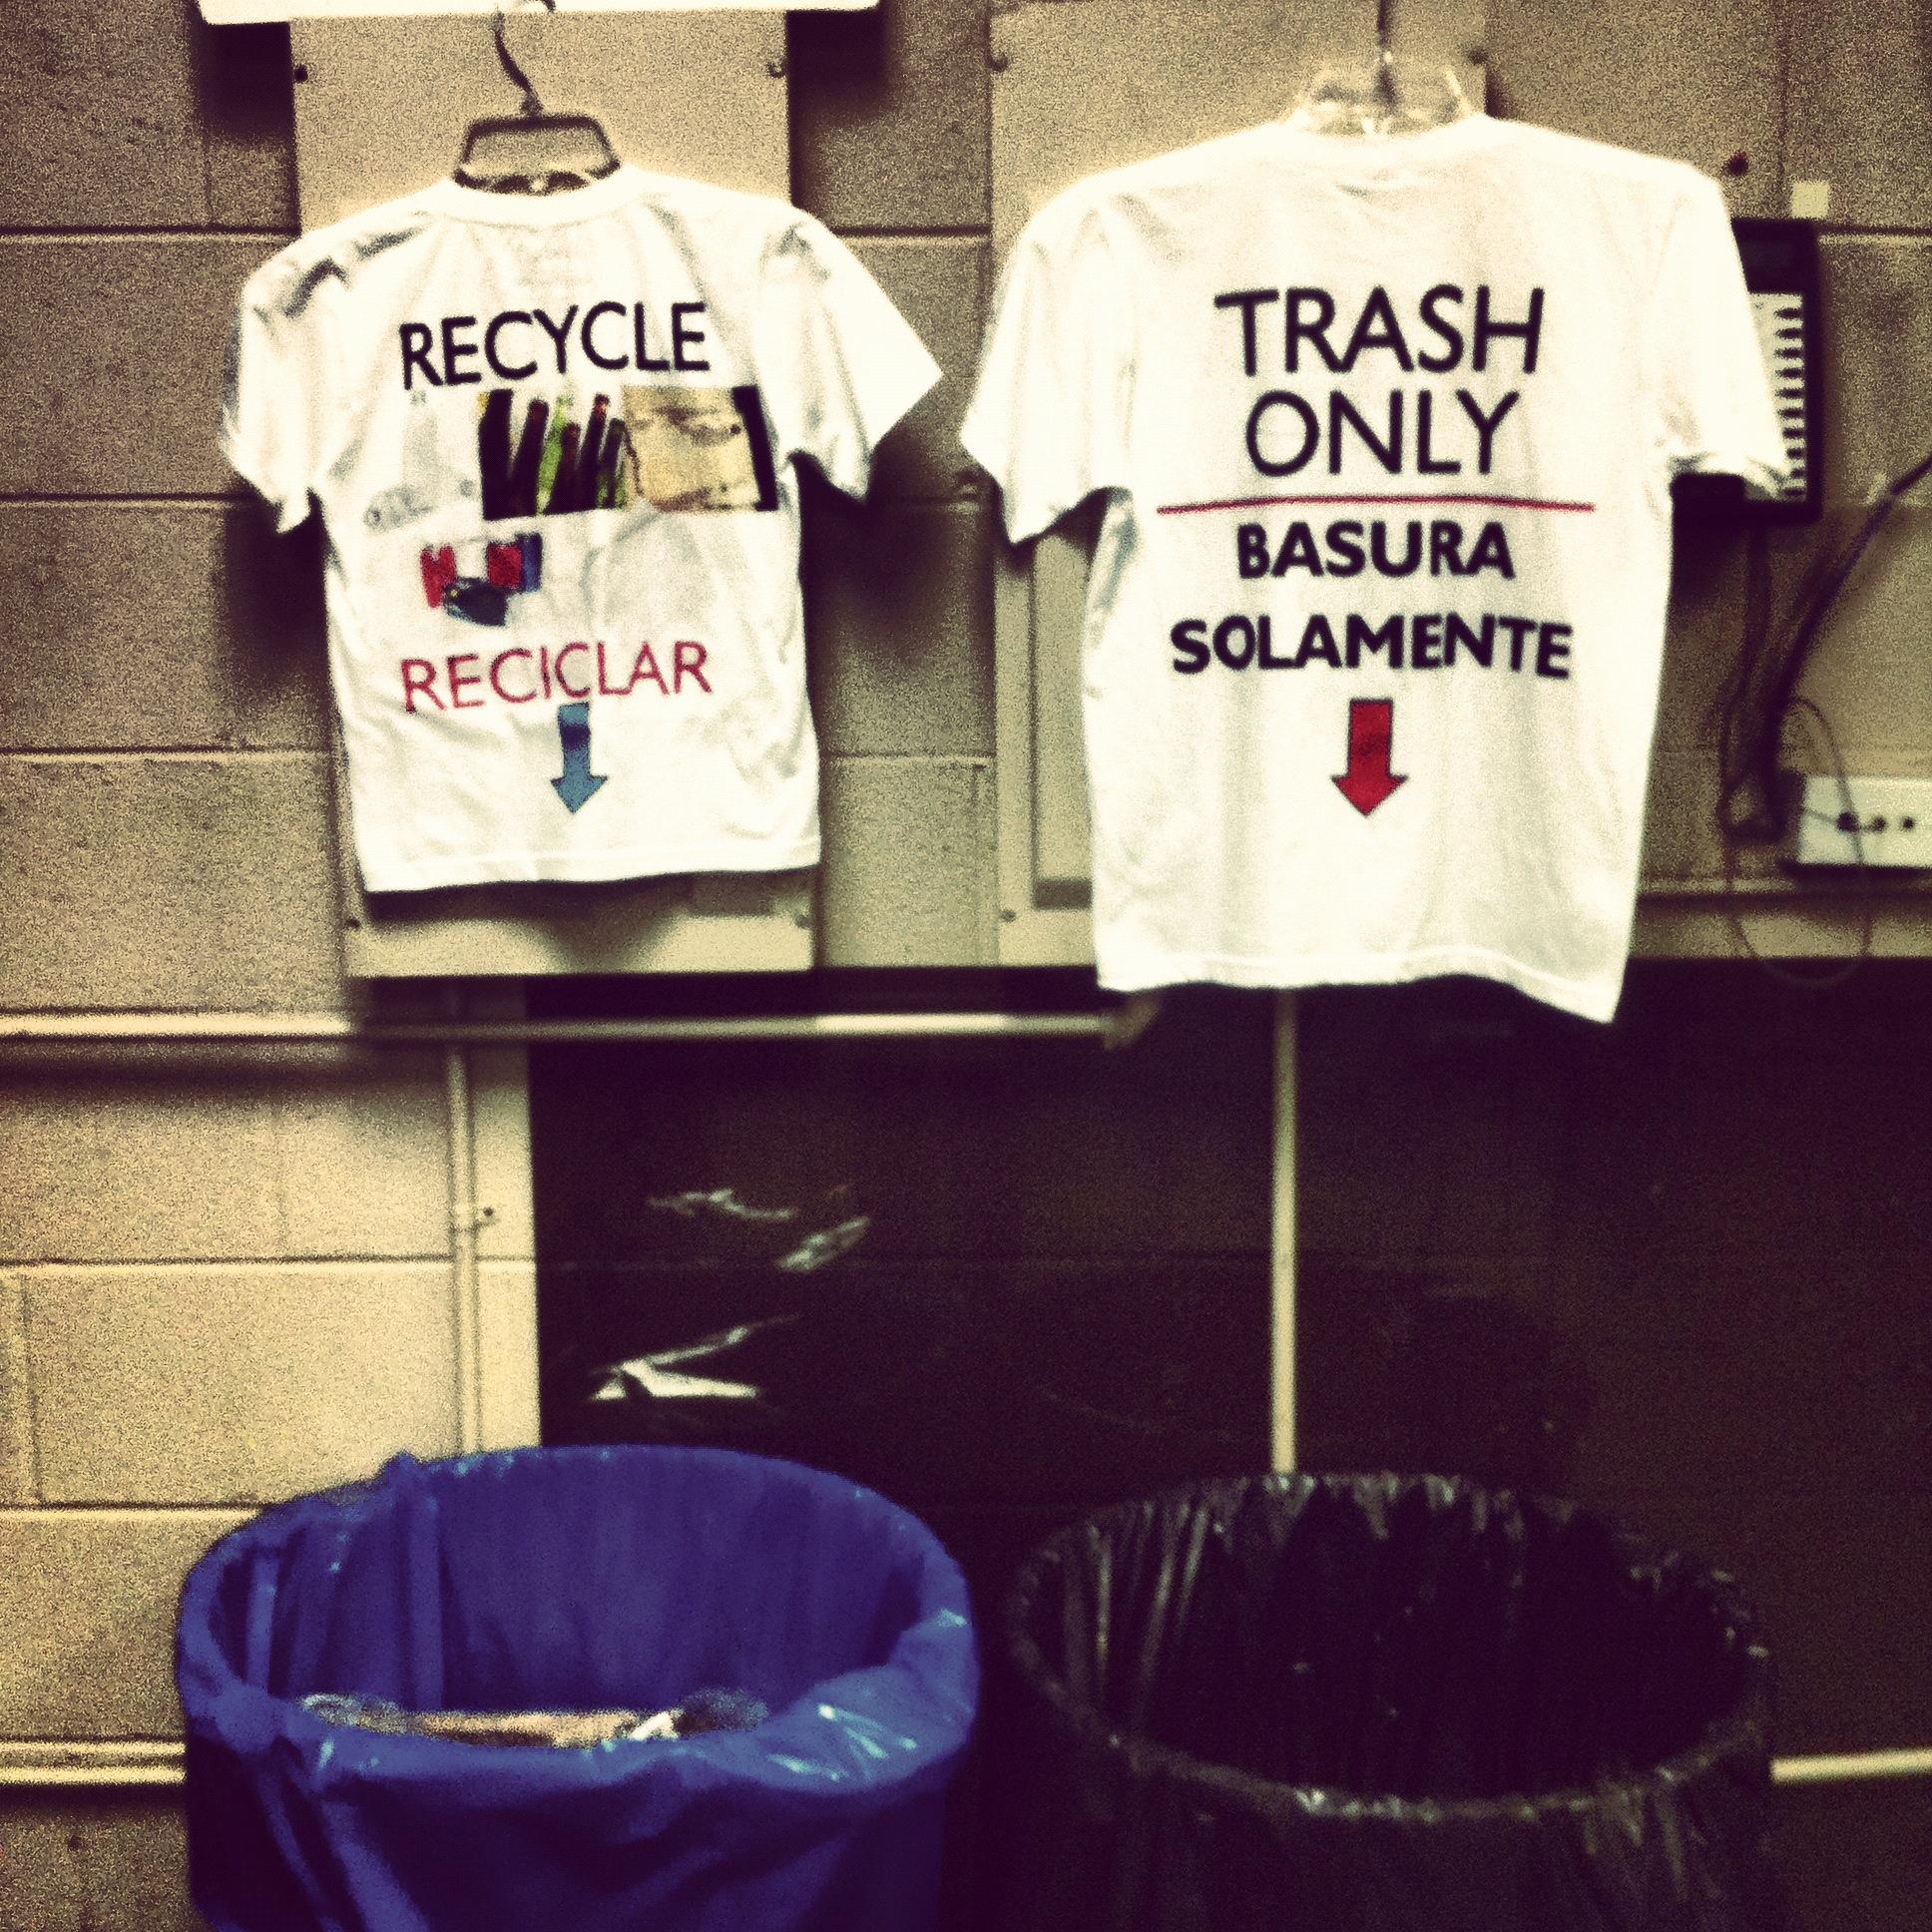 Designated Recycling